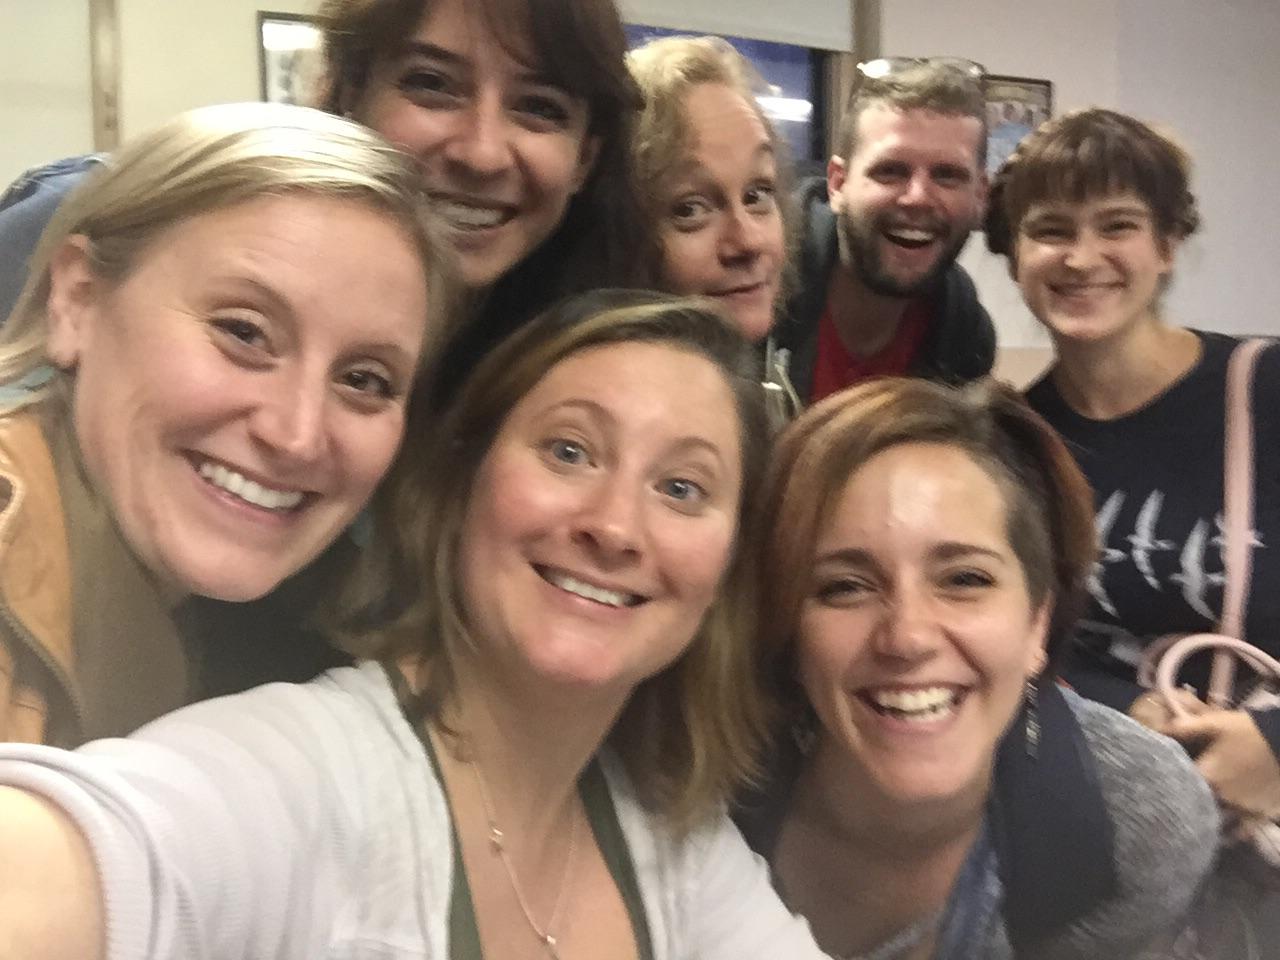 The awesome art-makers of the  Tyndale Place  workshop. (L-R) Emily Kleimo, Michaela Shuchman, Monica Stephenson, Jennifer Childs, TJ Harris, Rachel Camp, Laurel Hostak.